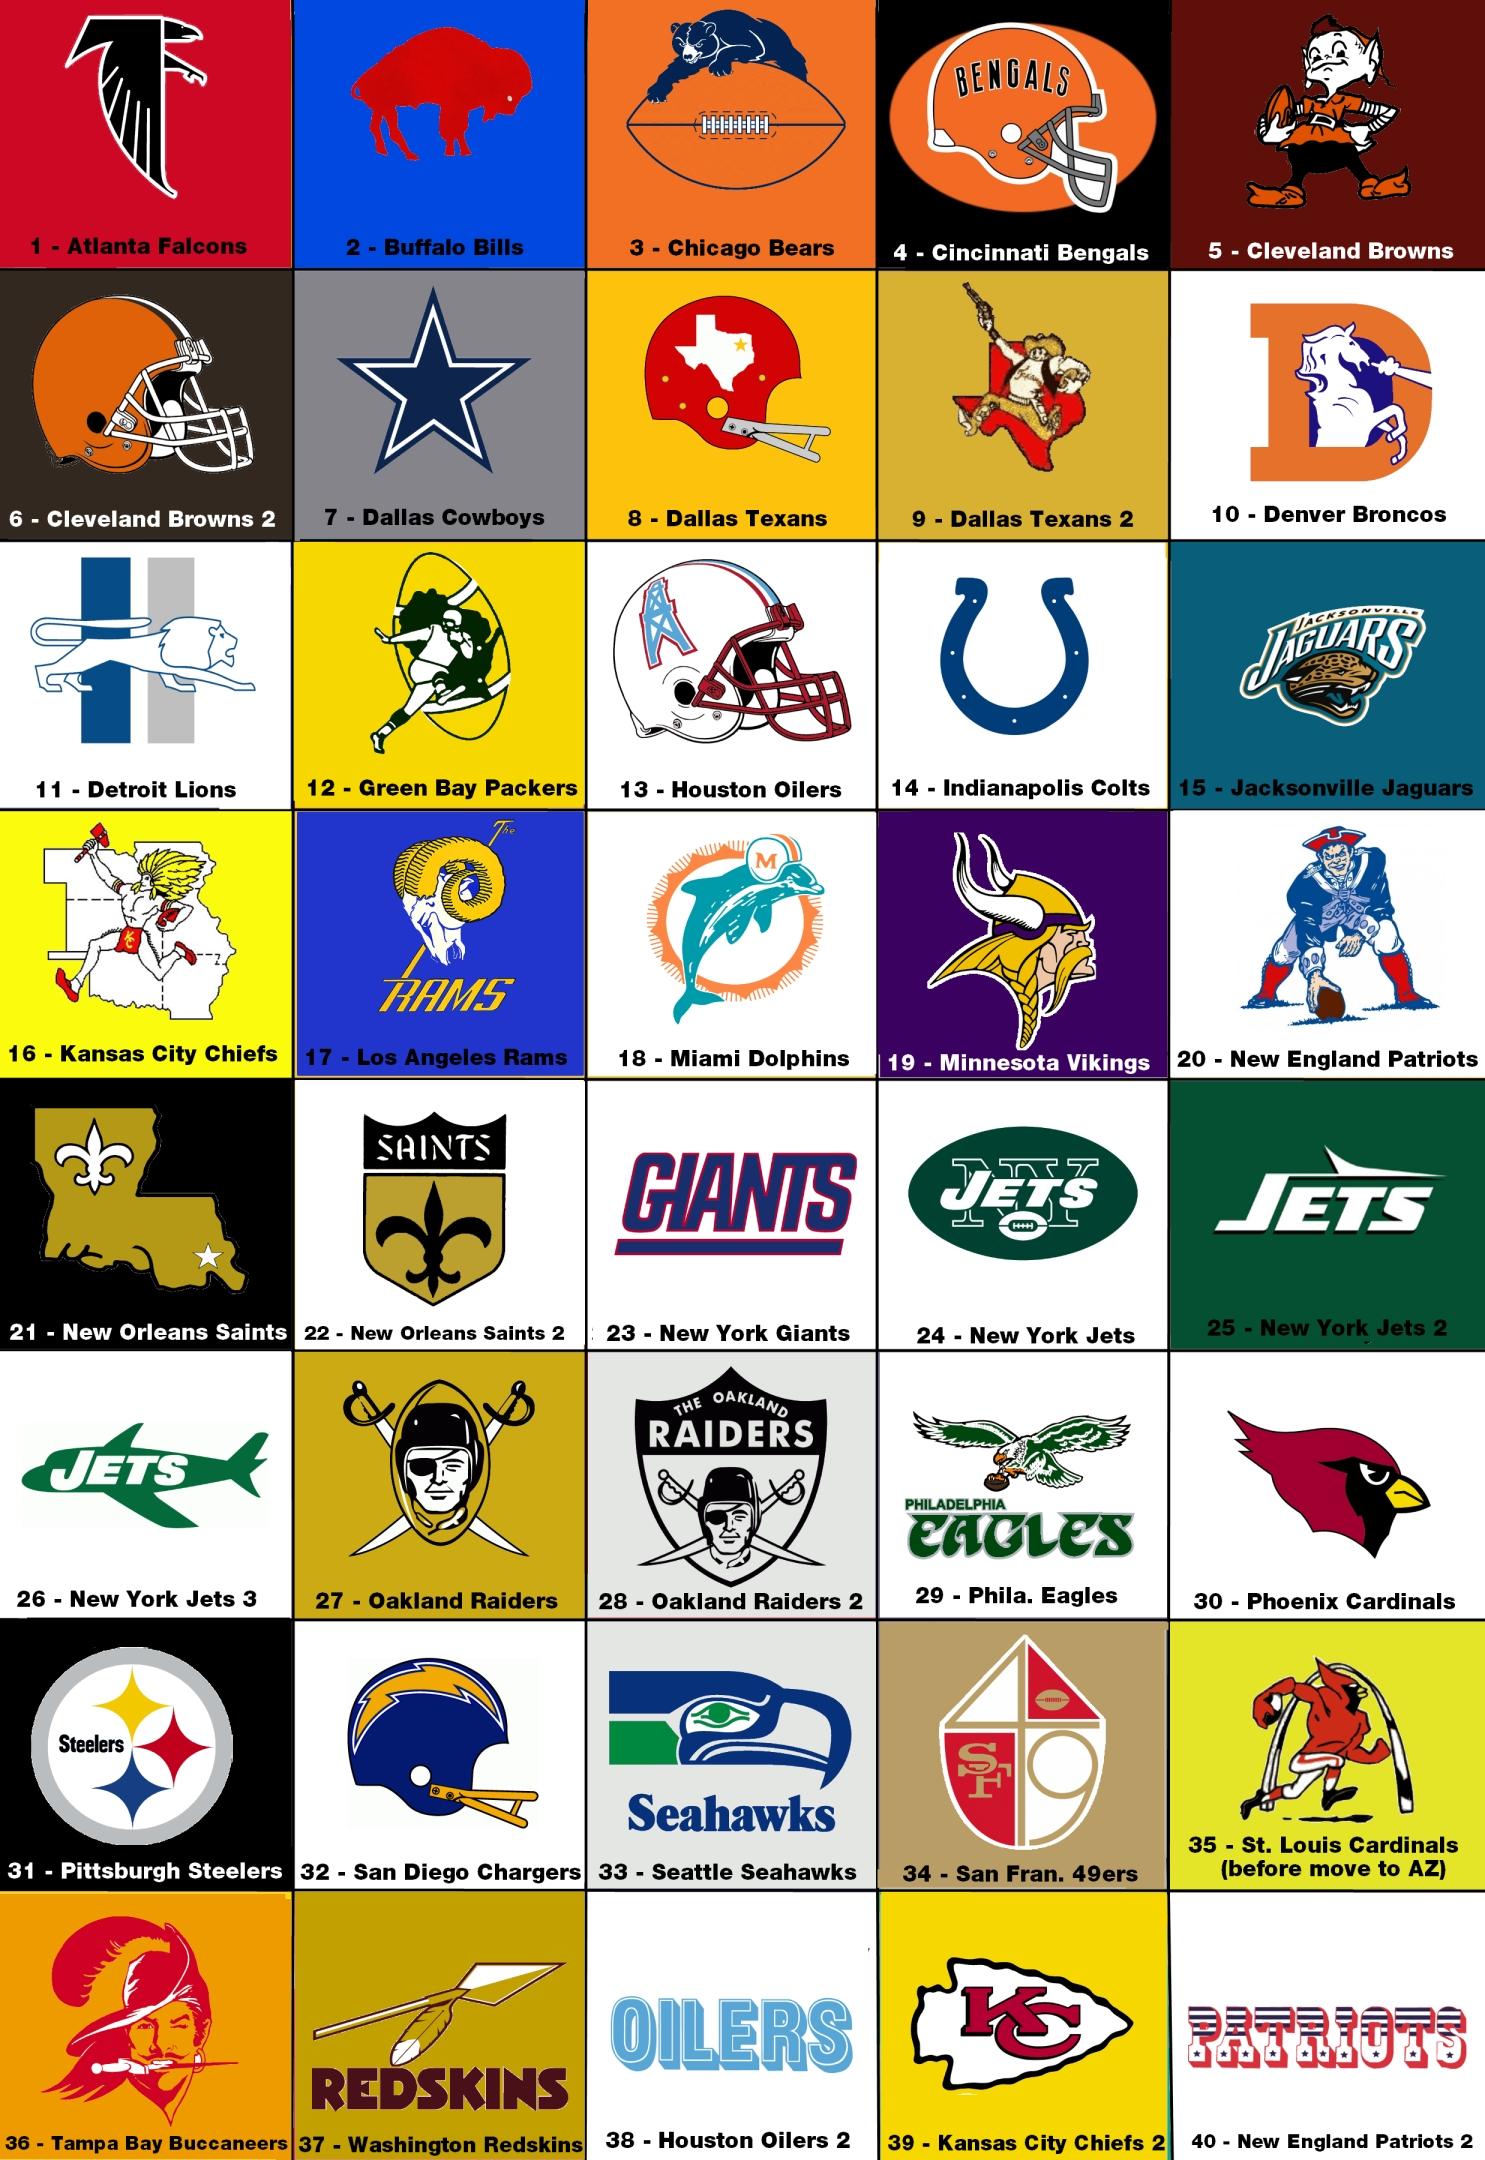 Football team logos and names